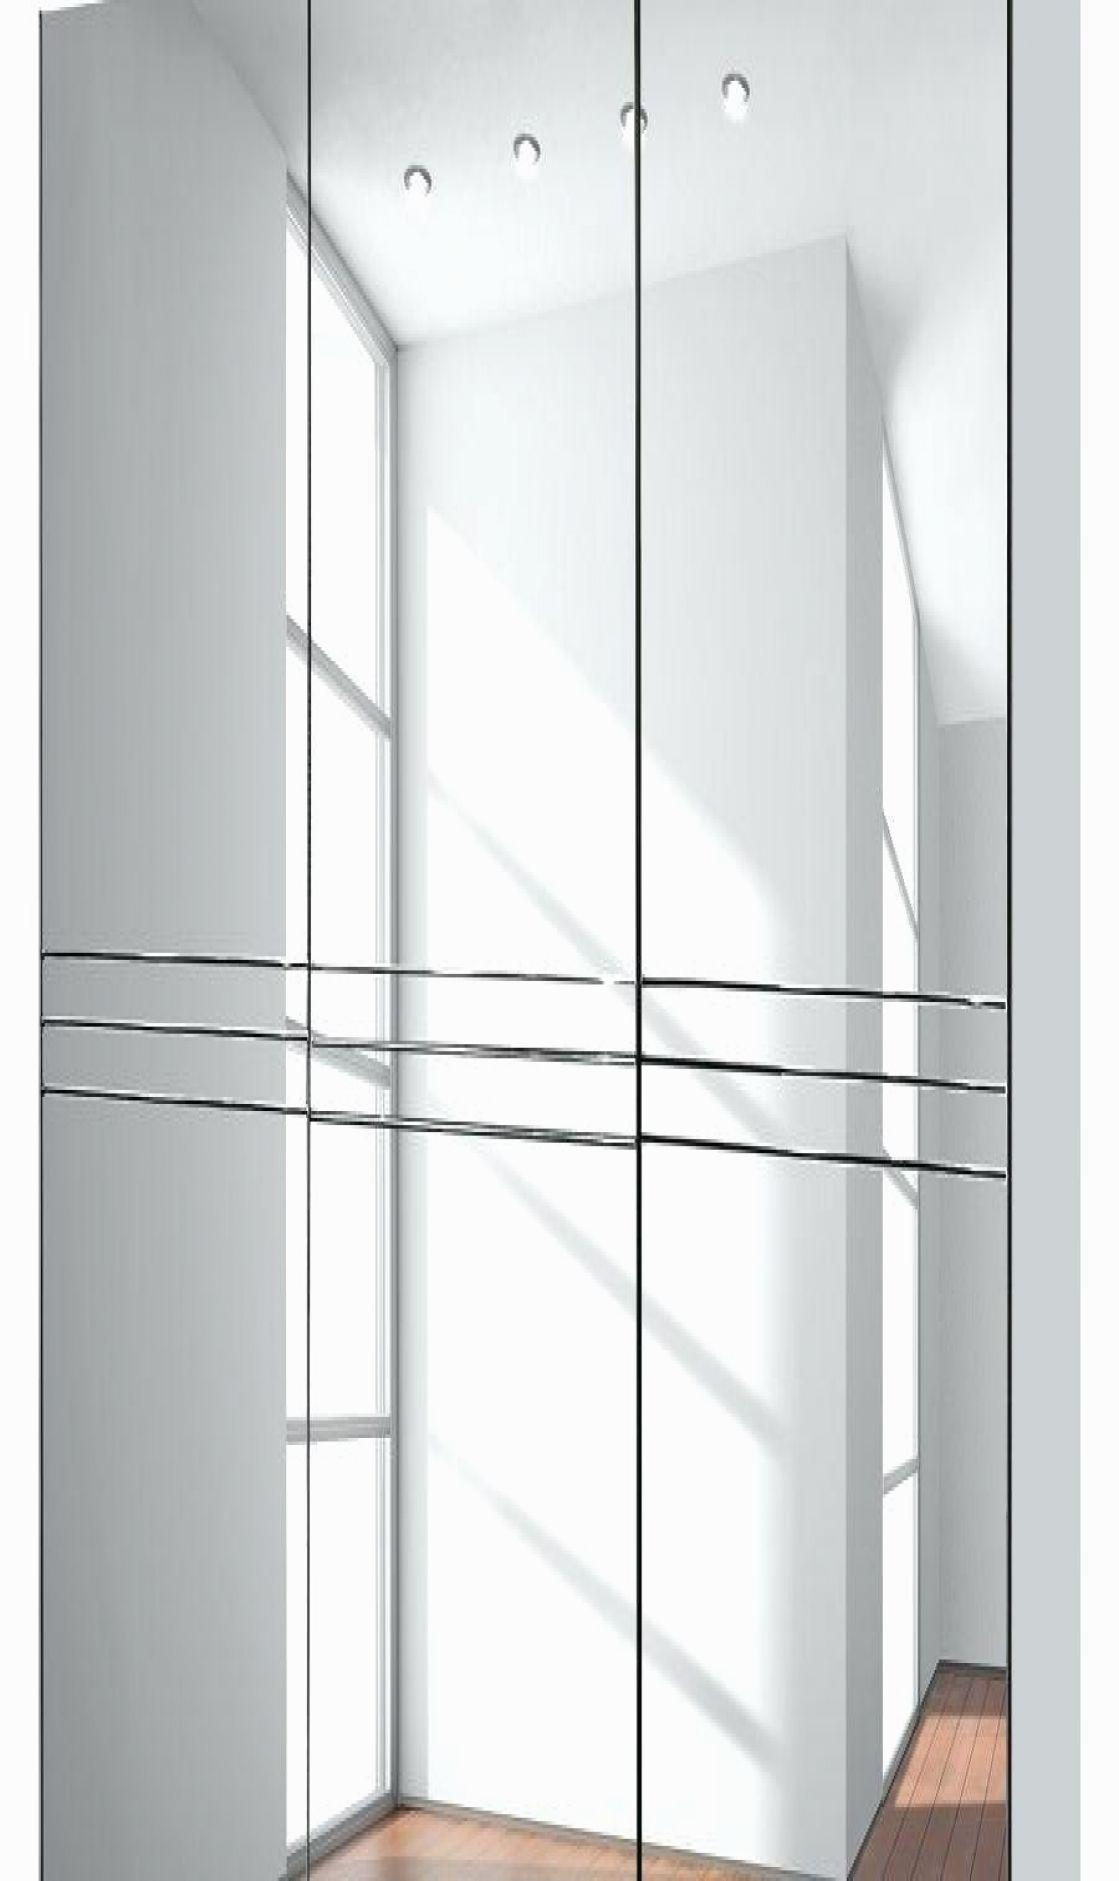 21 Elegant Schrank 300 Cm Breit In 2020 Furniture Room Home Decor